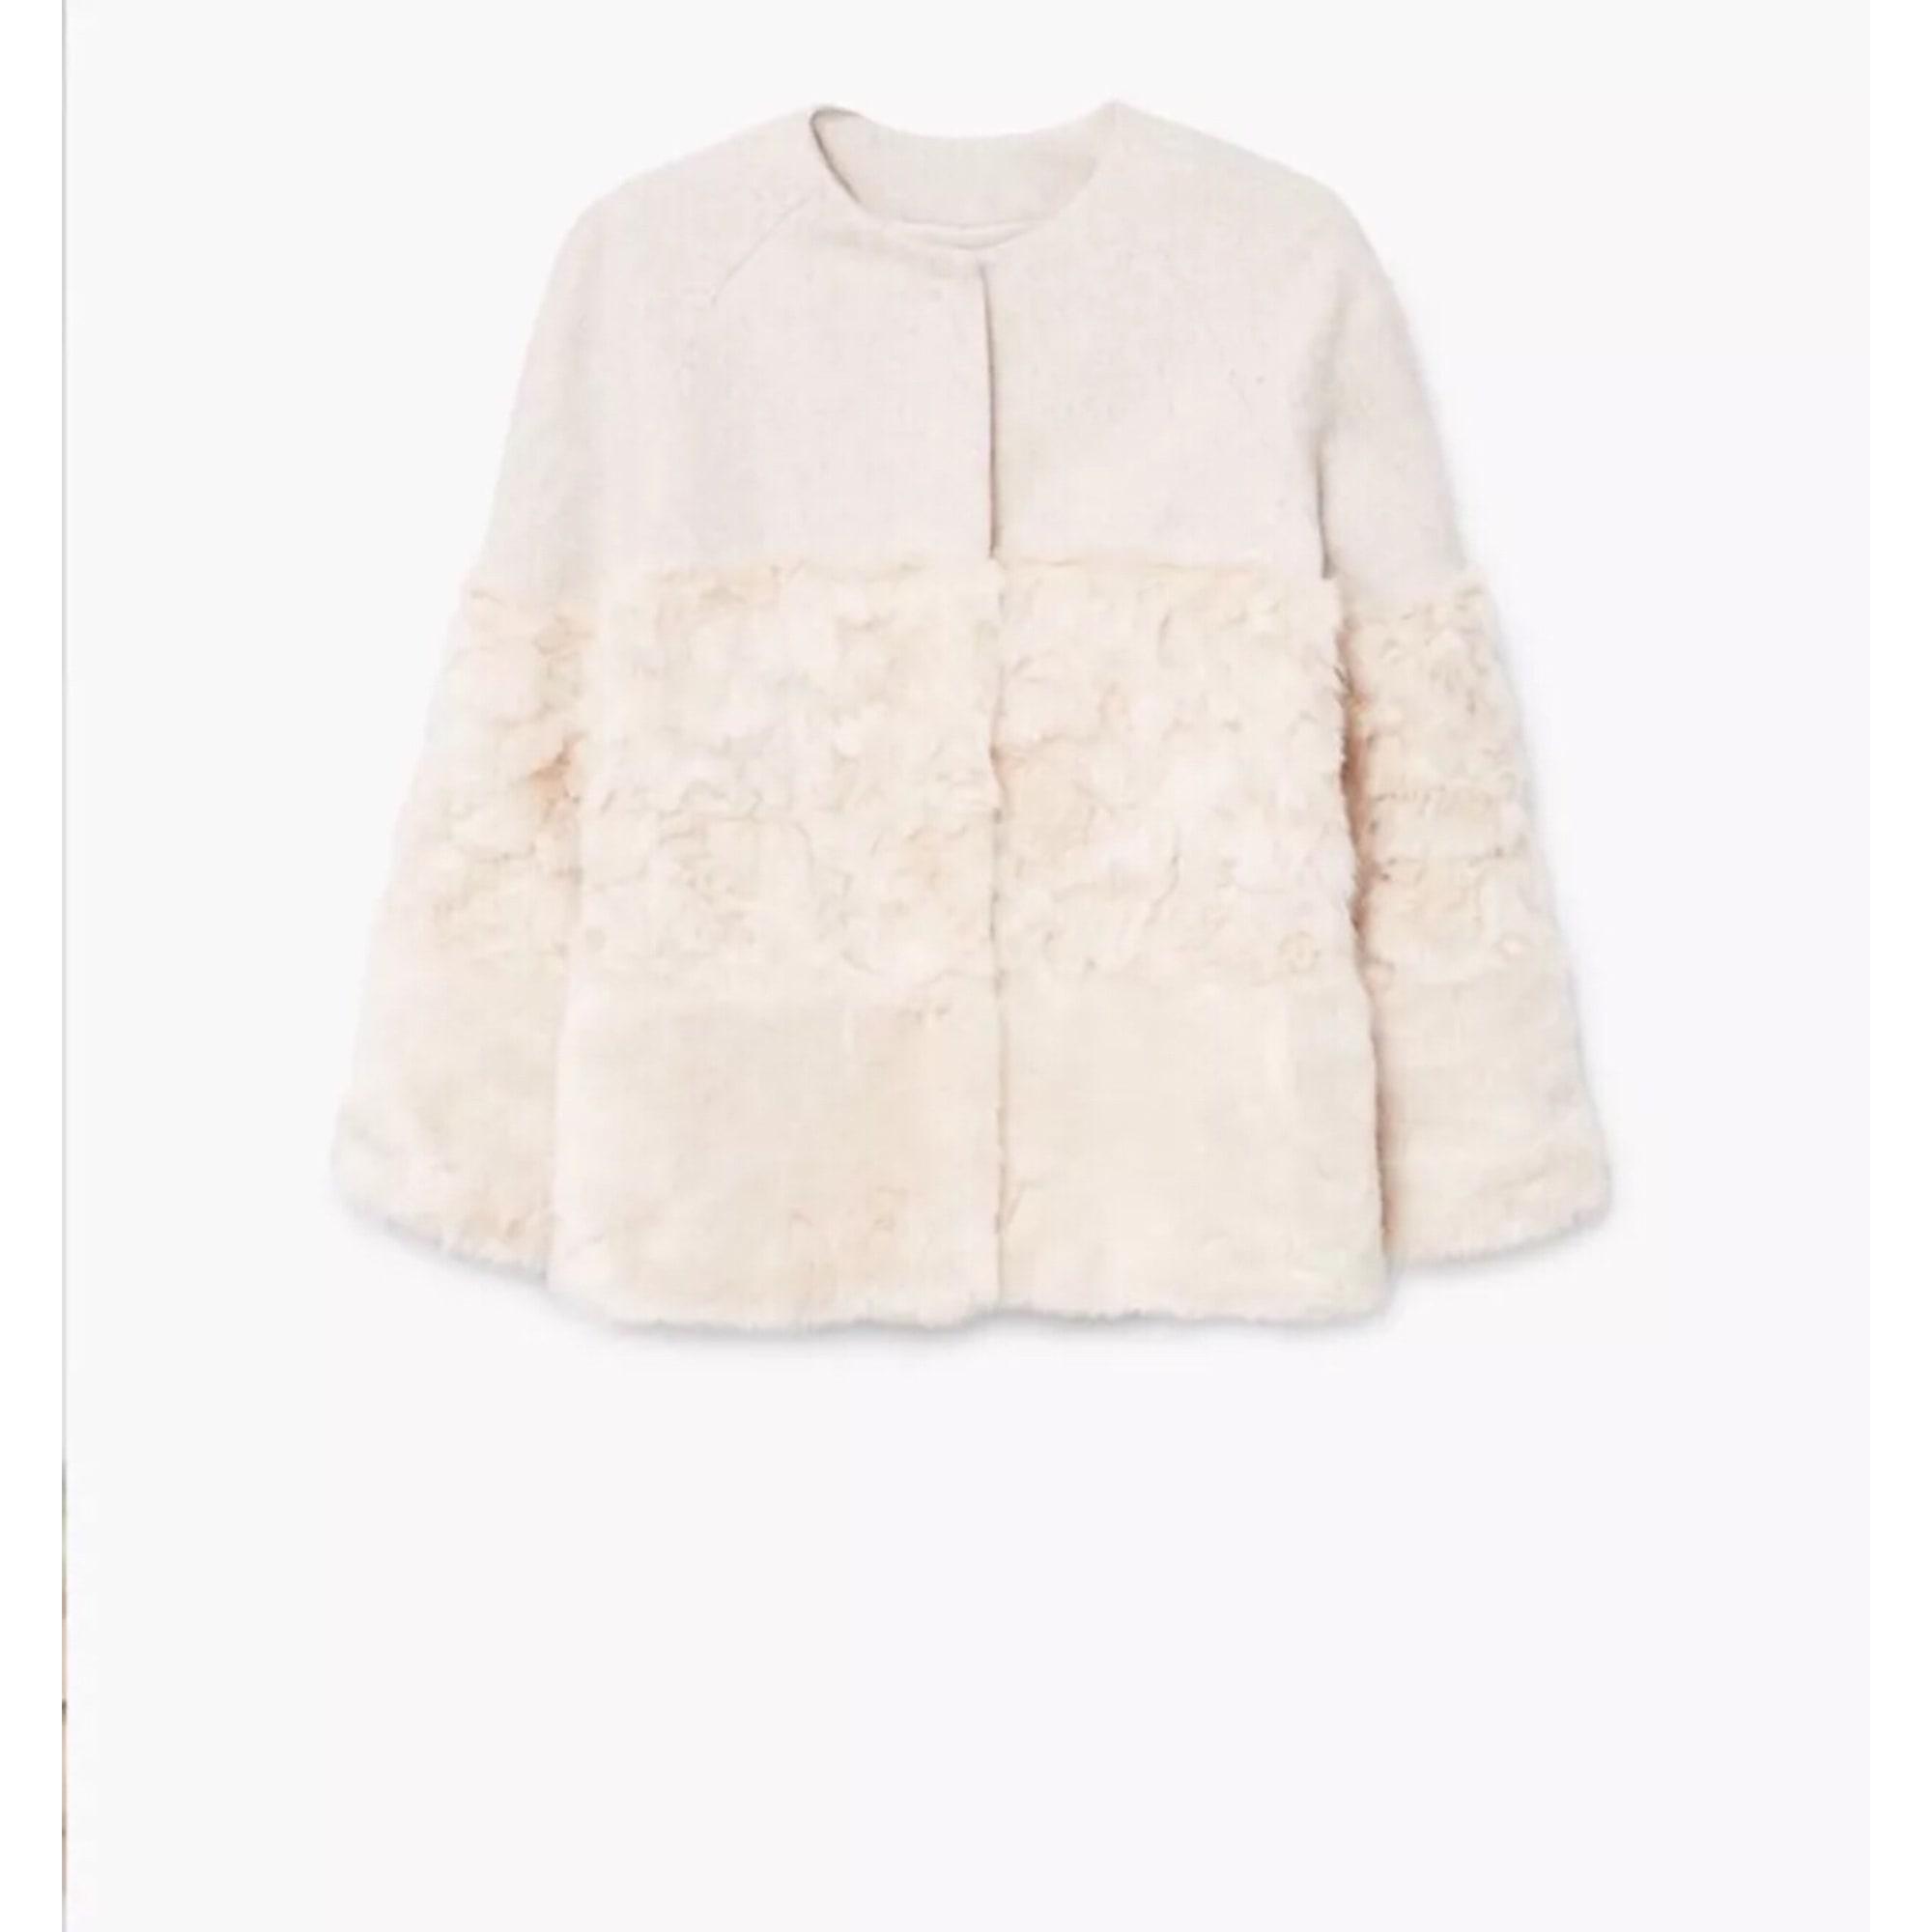 Blouson, veste en fourrure MANGO 34 (XS, T0) blanc vendu par Alexn ... 26bf2ef090d4